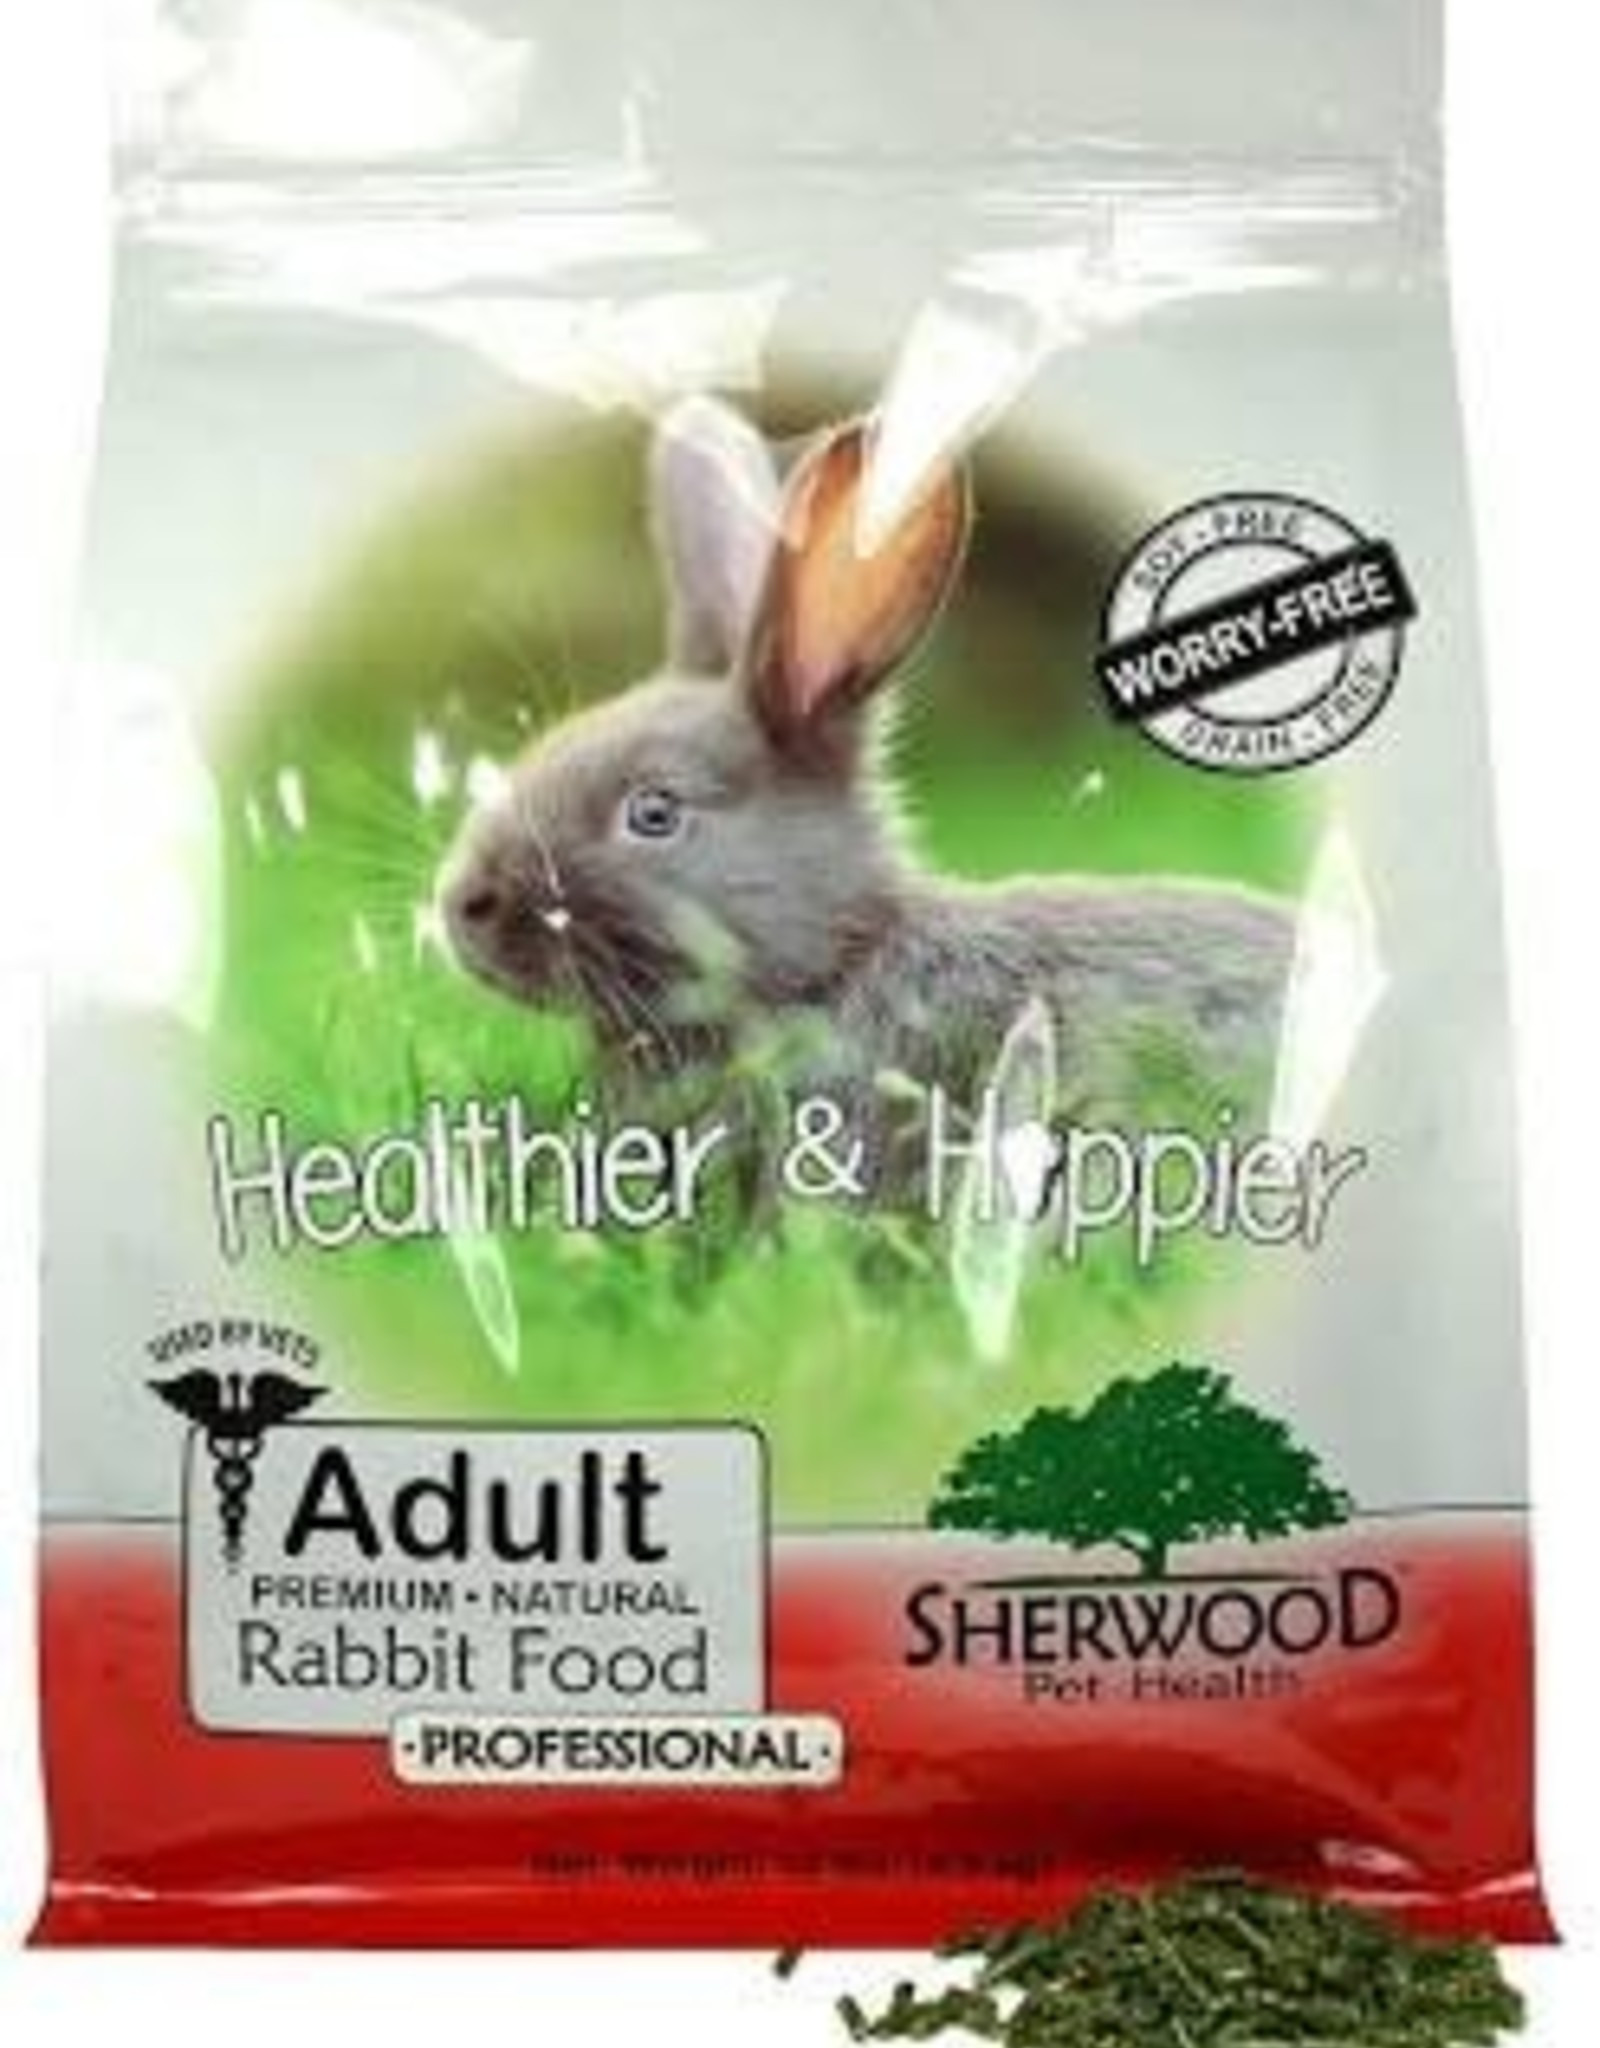 Sherwood Healthier & Hoppier Adult Rabbit Food